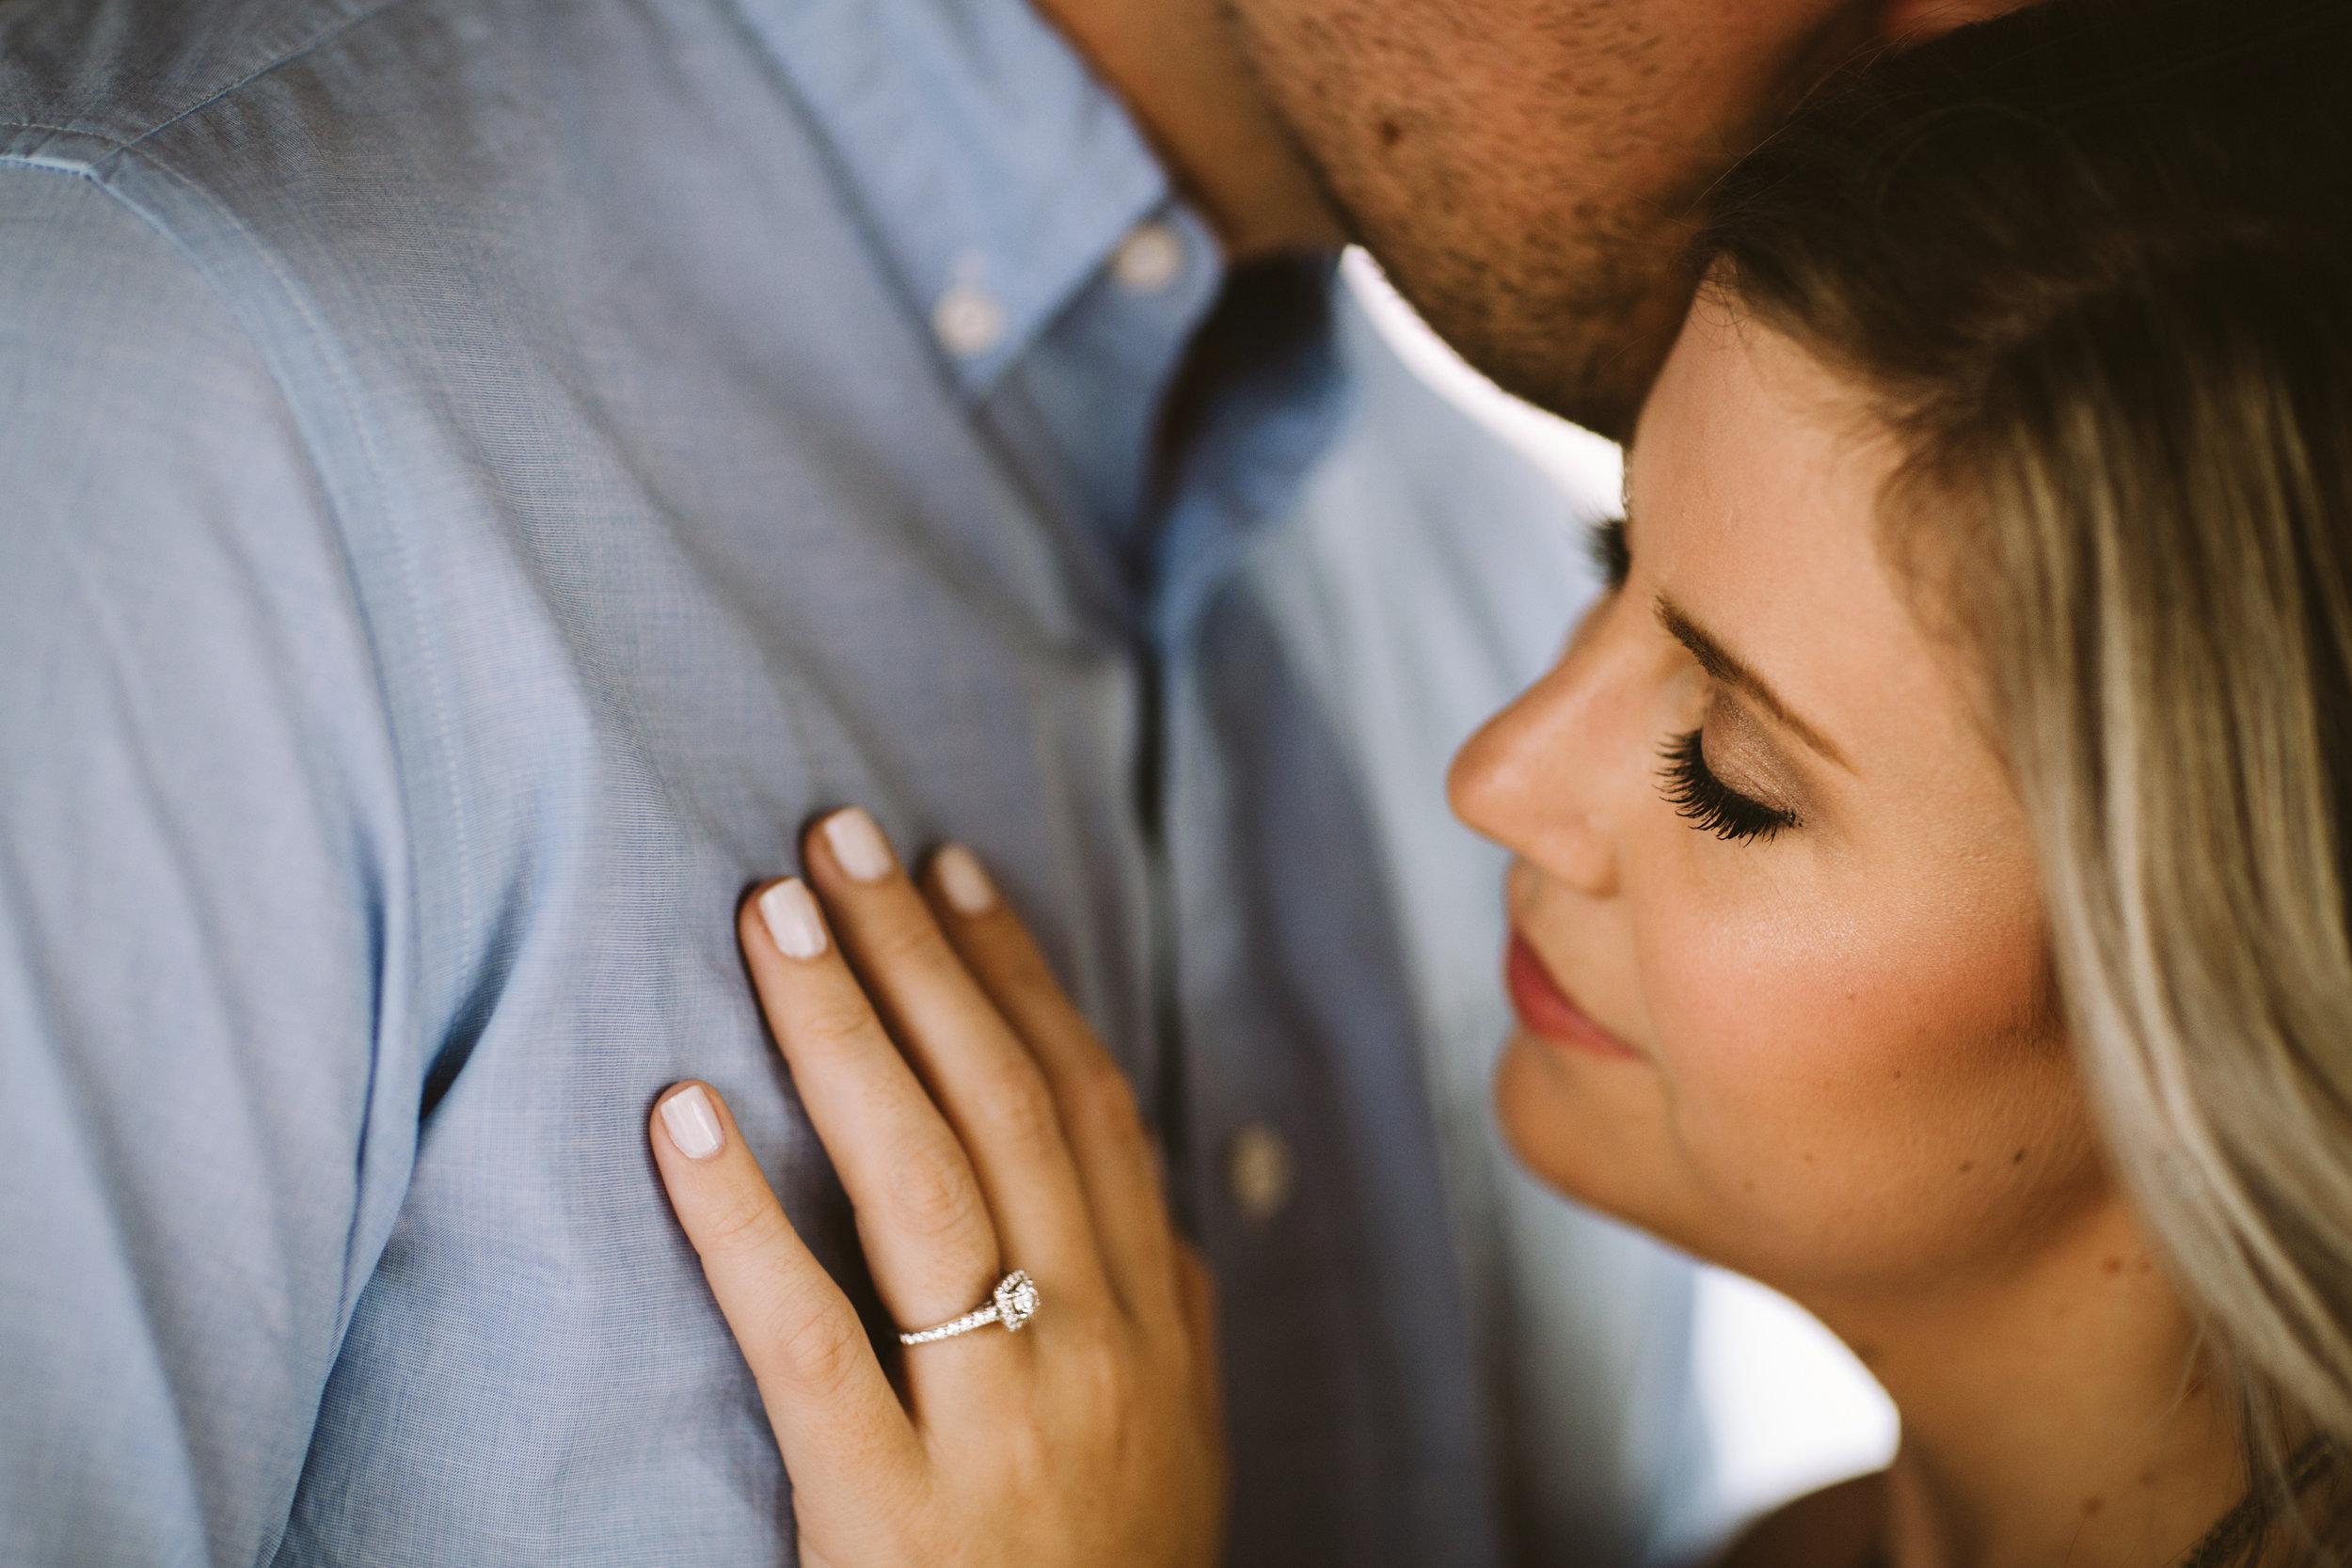 engagement | Vanessa Boy Photography | vanessaboy.com |-10.com |final..jpg